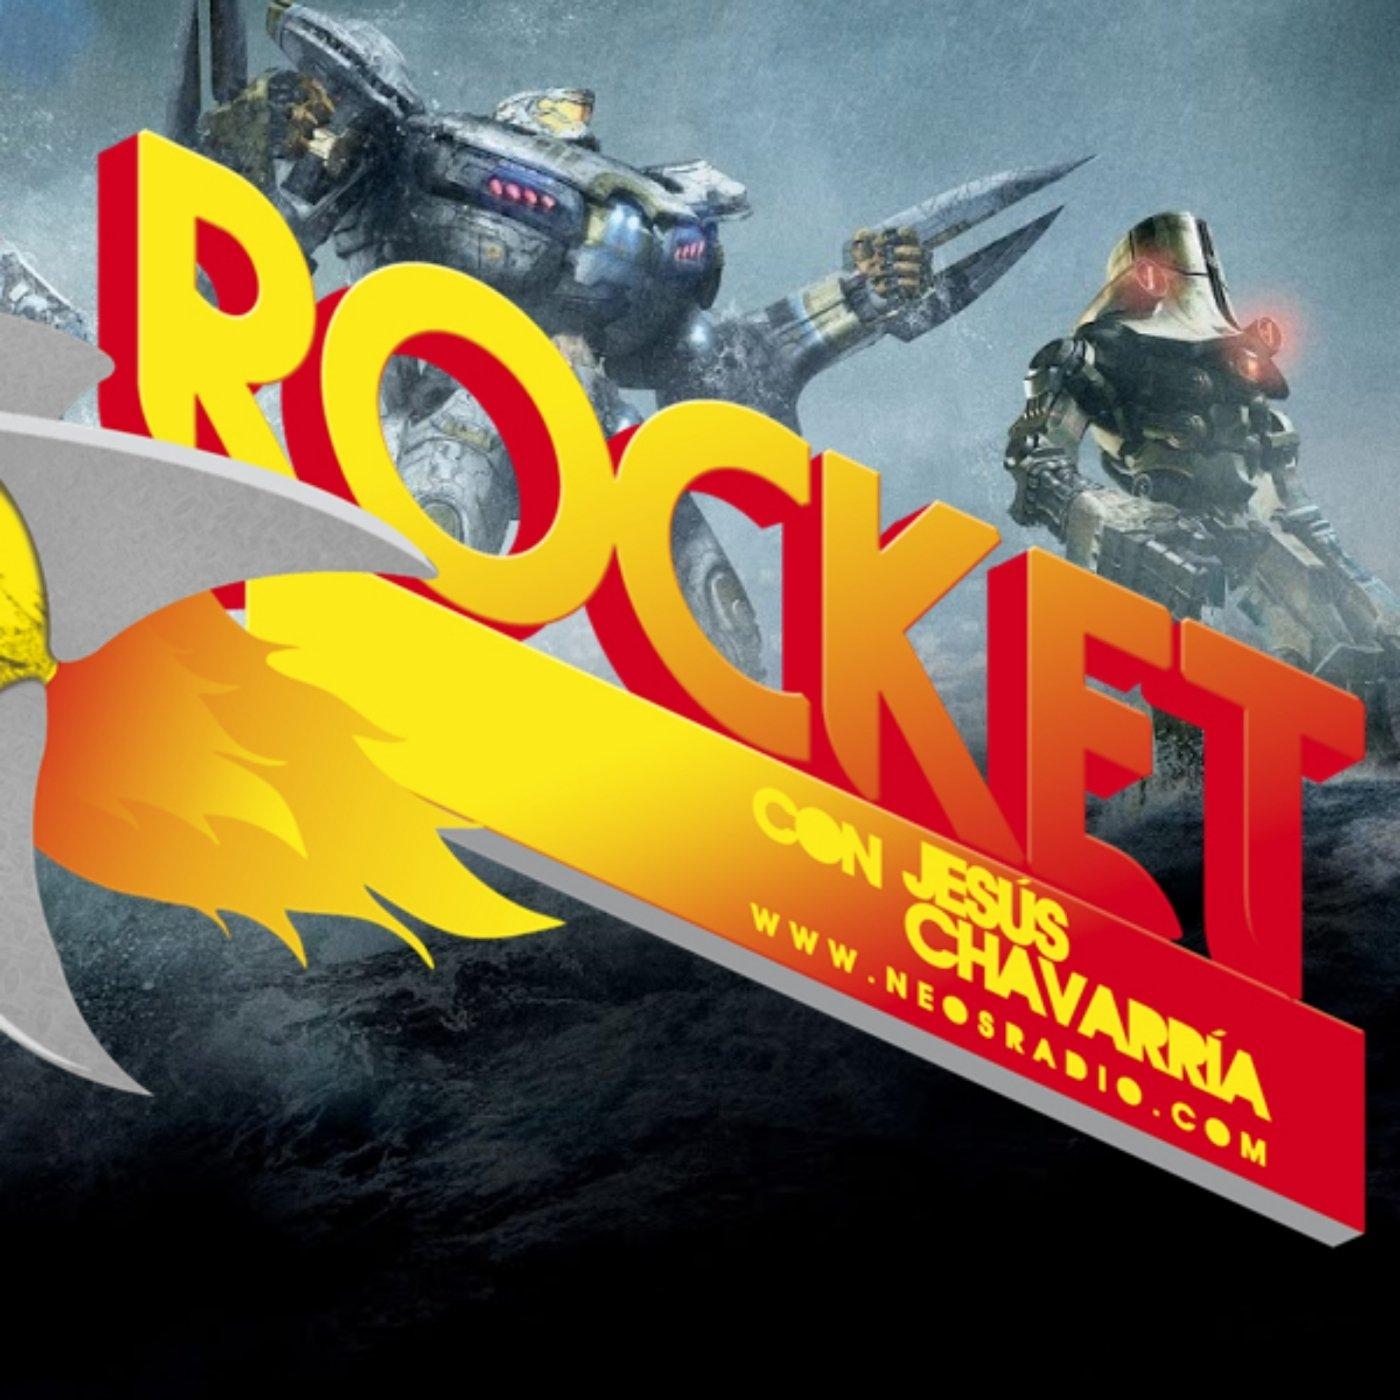 <![CDATA[Rocket]]>